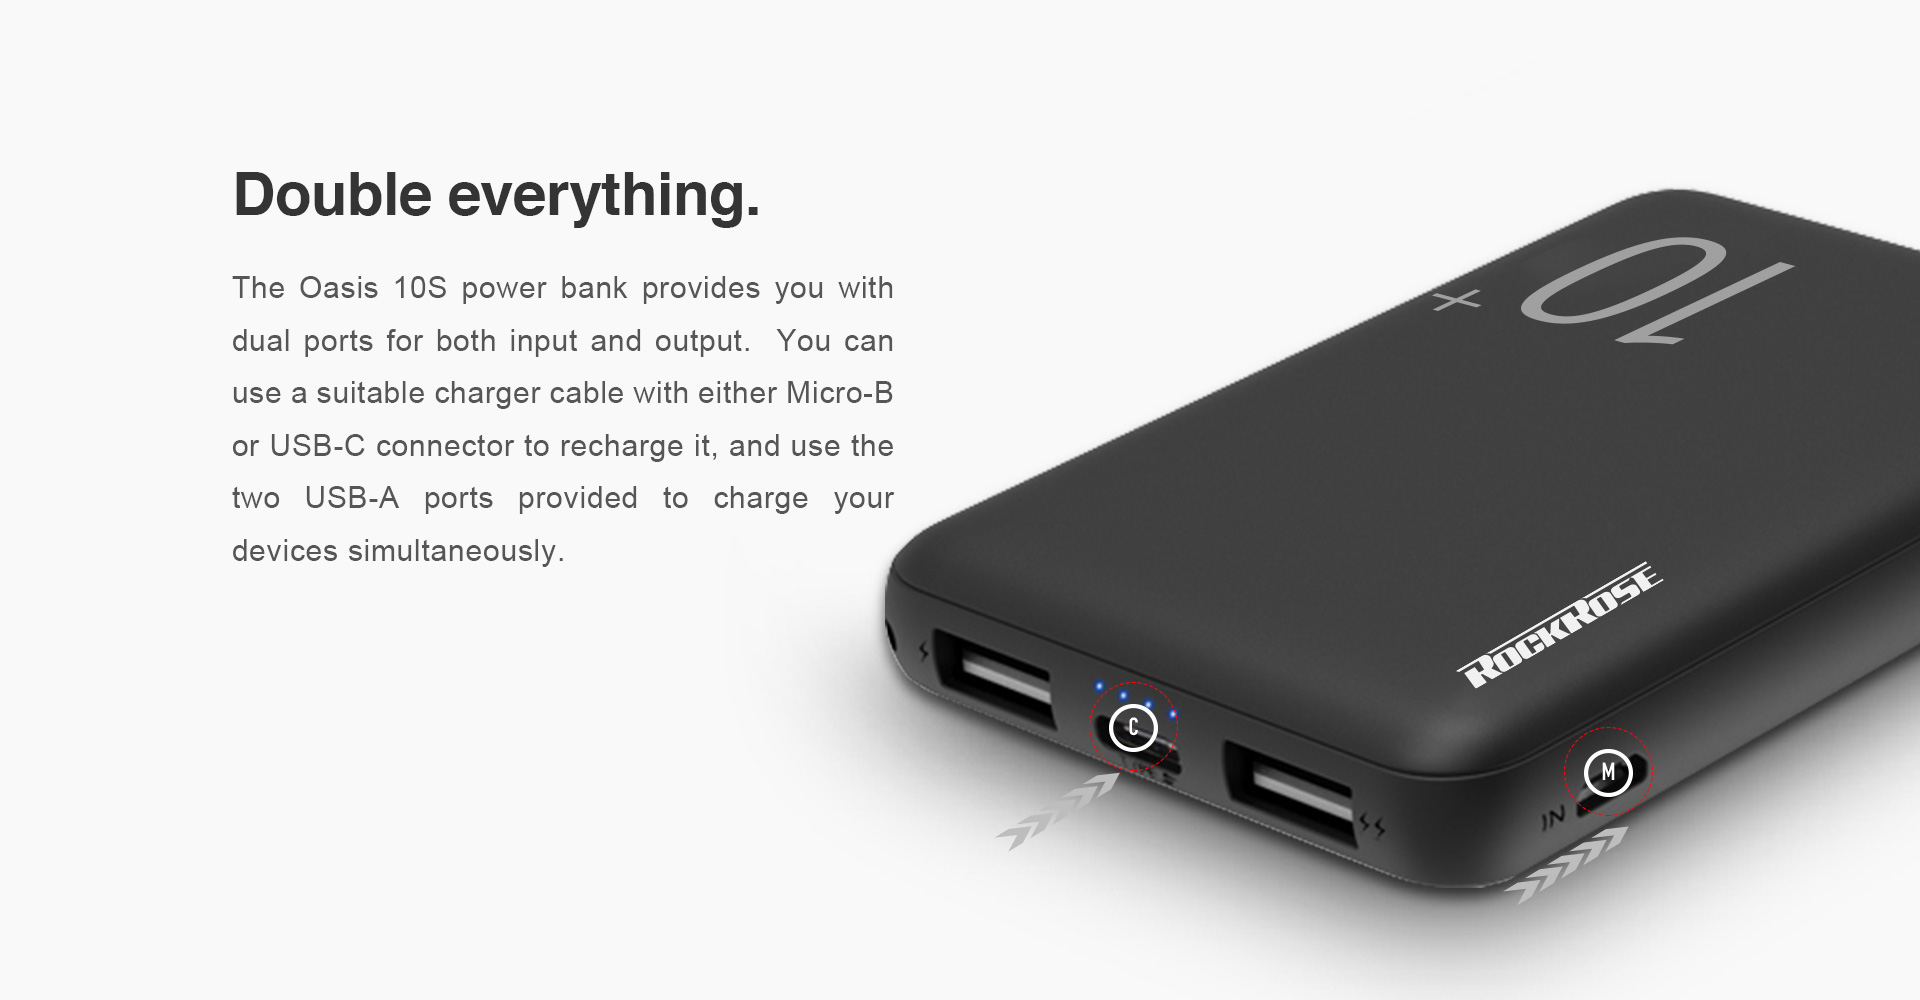 Oasis 10S - screen protector - Rockrose Technology Co., Ltd.